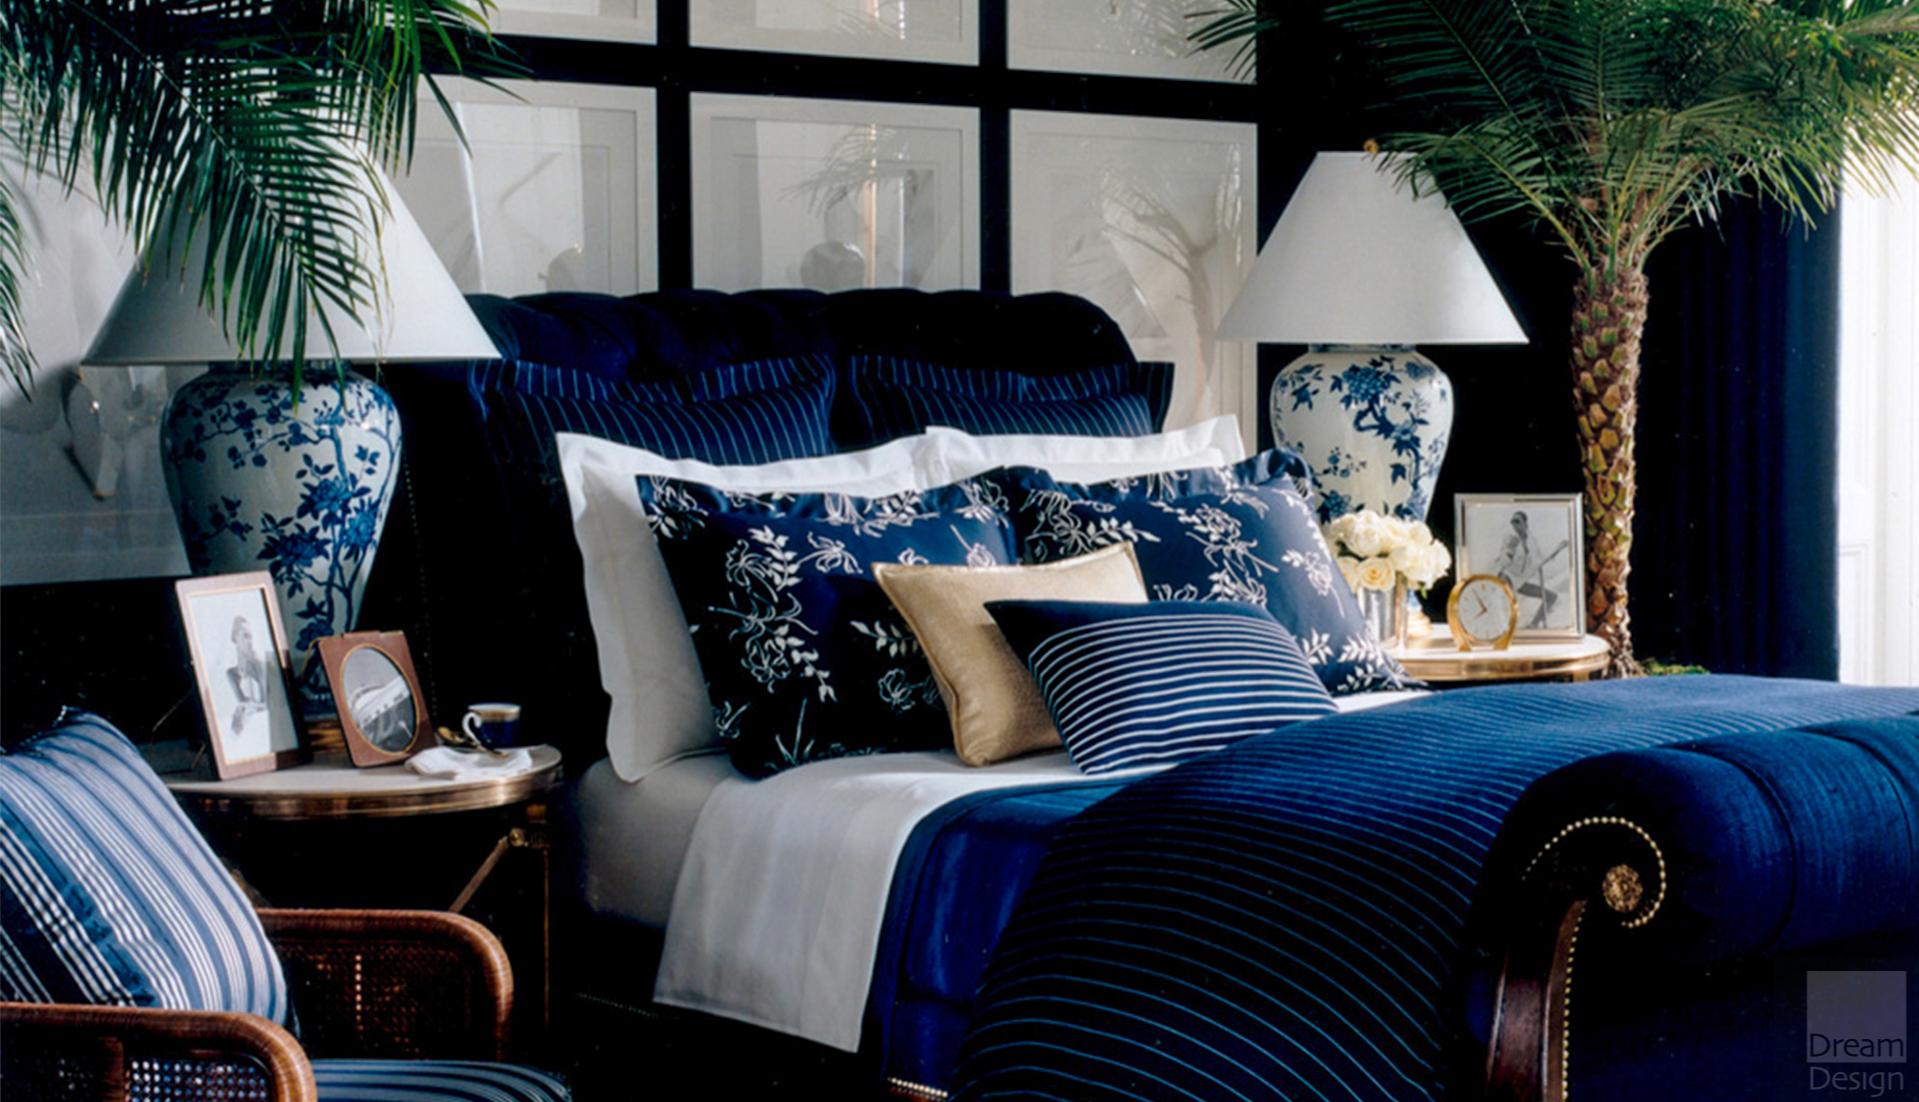 Ralph Lauren Home Gable Table Lamp Dream Design Interiors Ltd